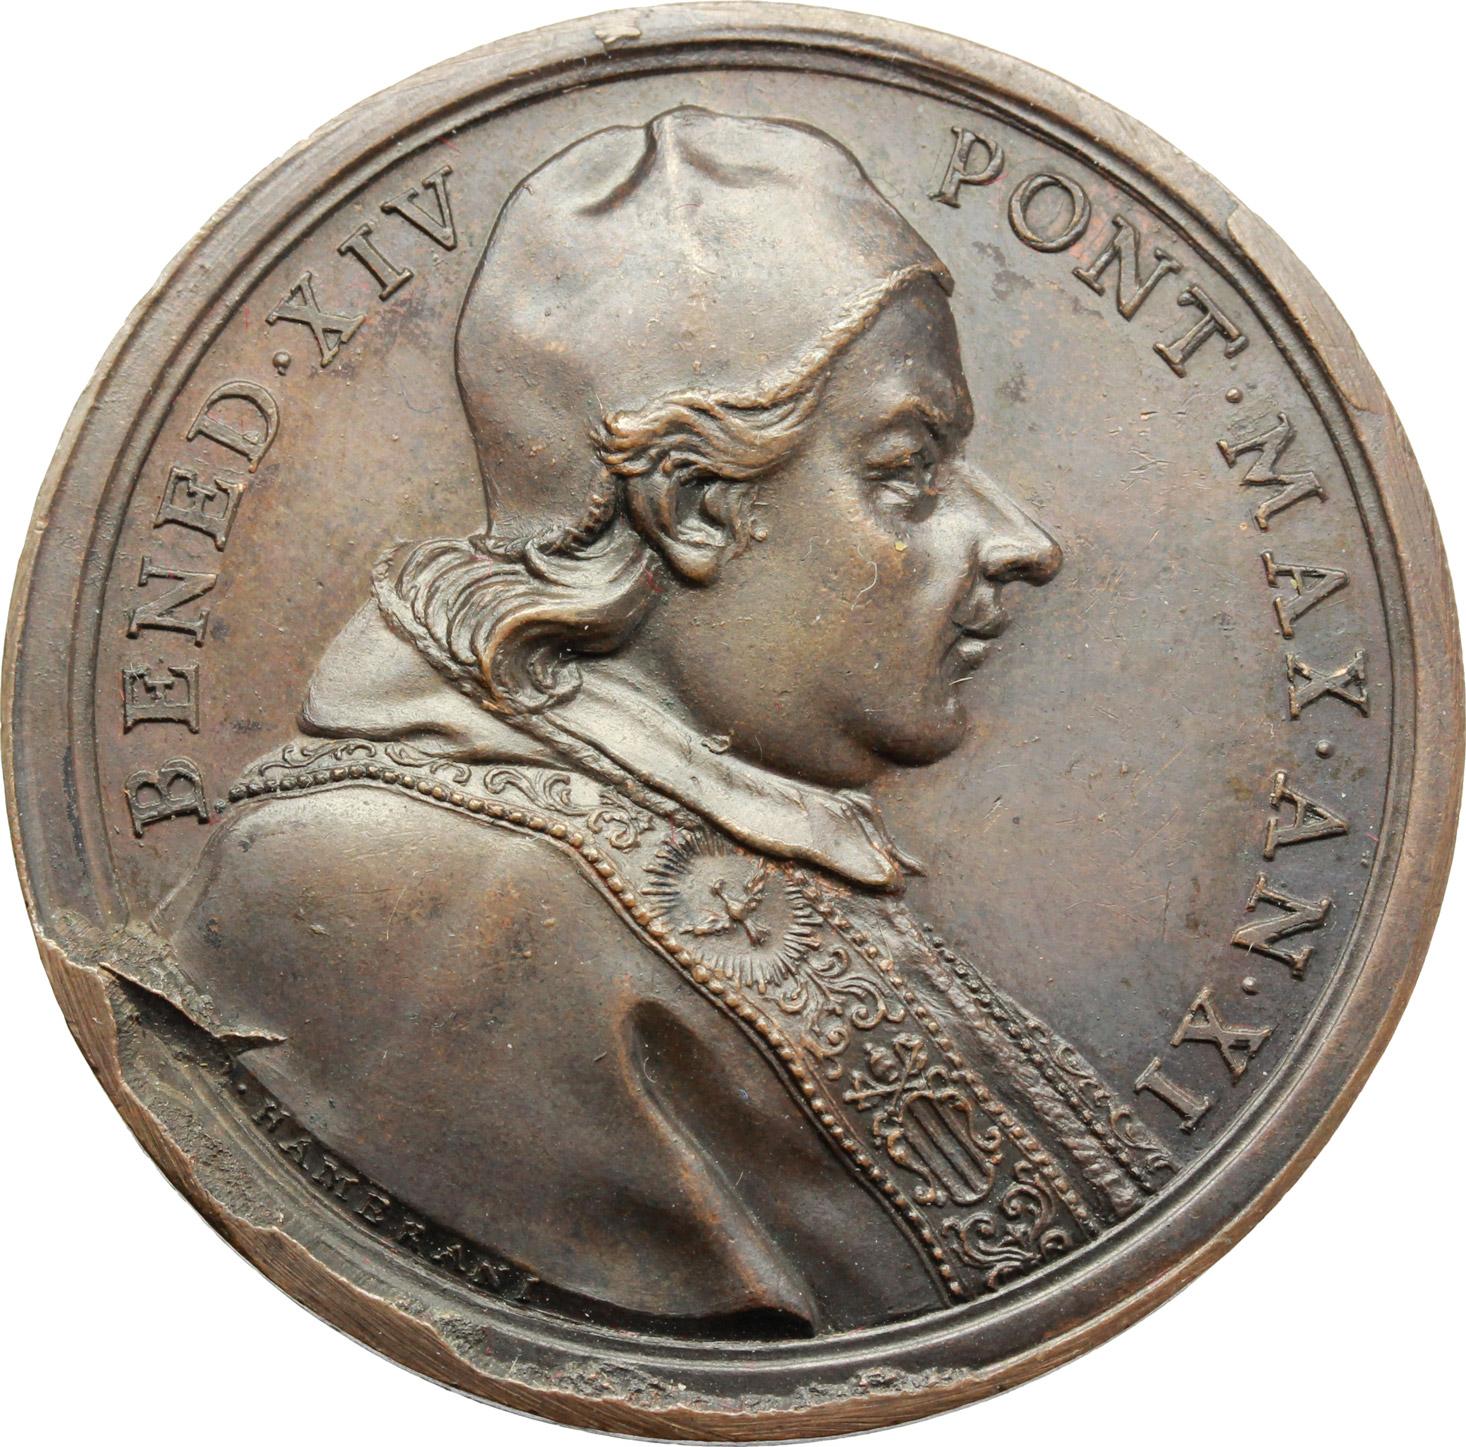 D/ Benedetto XIV (1740-1758), Prospero Lambertini. Medaglia A. XI.  D/ BENED XIV PONT MAX AN. XI. Busto a destra con camauro, mozzetta e stola. R/ EGO IVSTITIAS IVDICABO. La Sapienza pontificia; a fianco, angelo con bilancia. In esergo, SEGNATVRA GRATIAE RESTITVTA. Patr. 63. AE.   mm. 40.00 Inc. O. Hamerani.   qSPL.